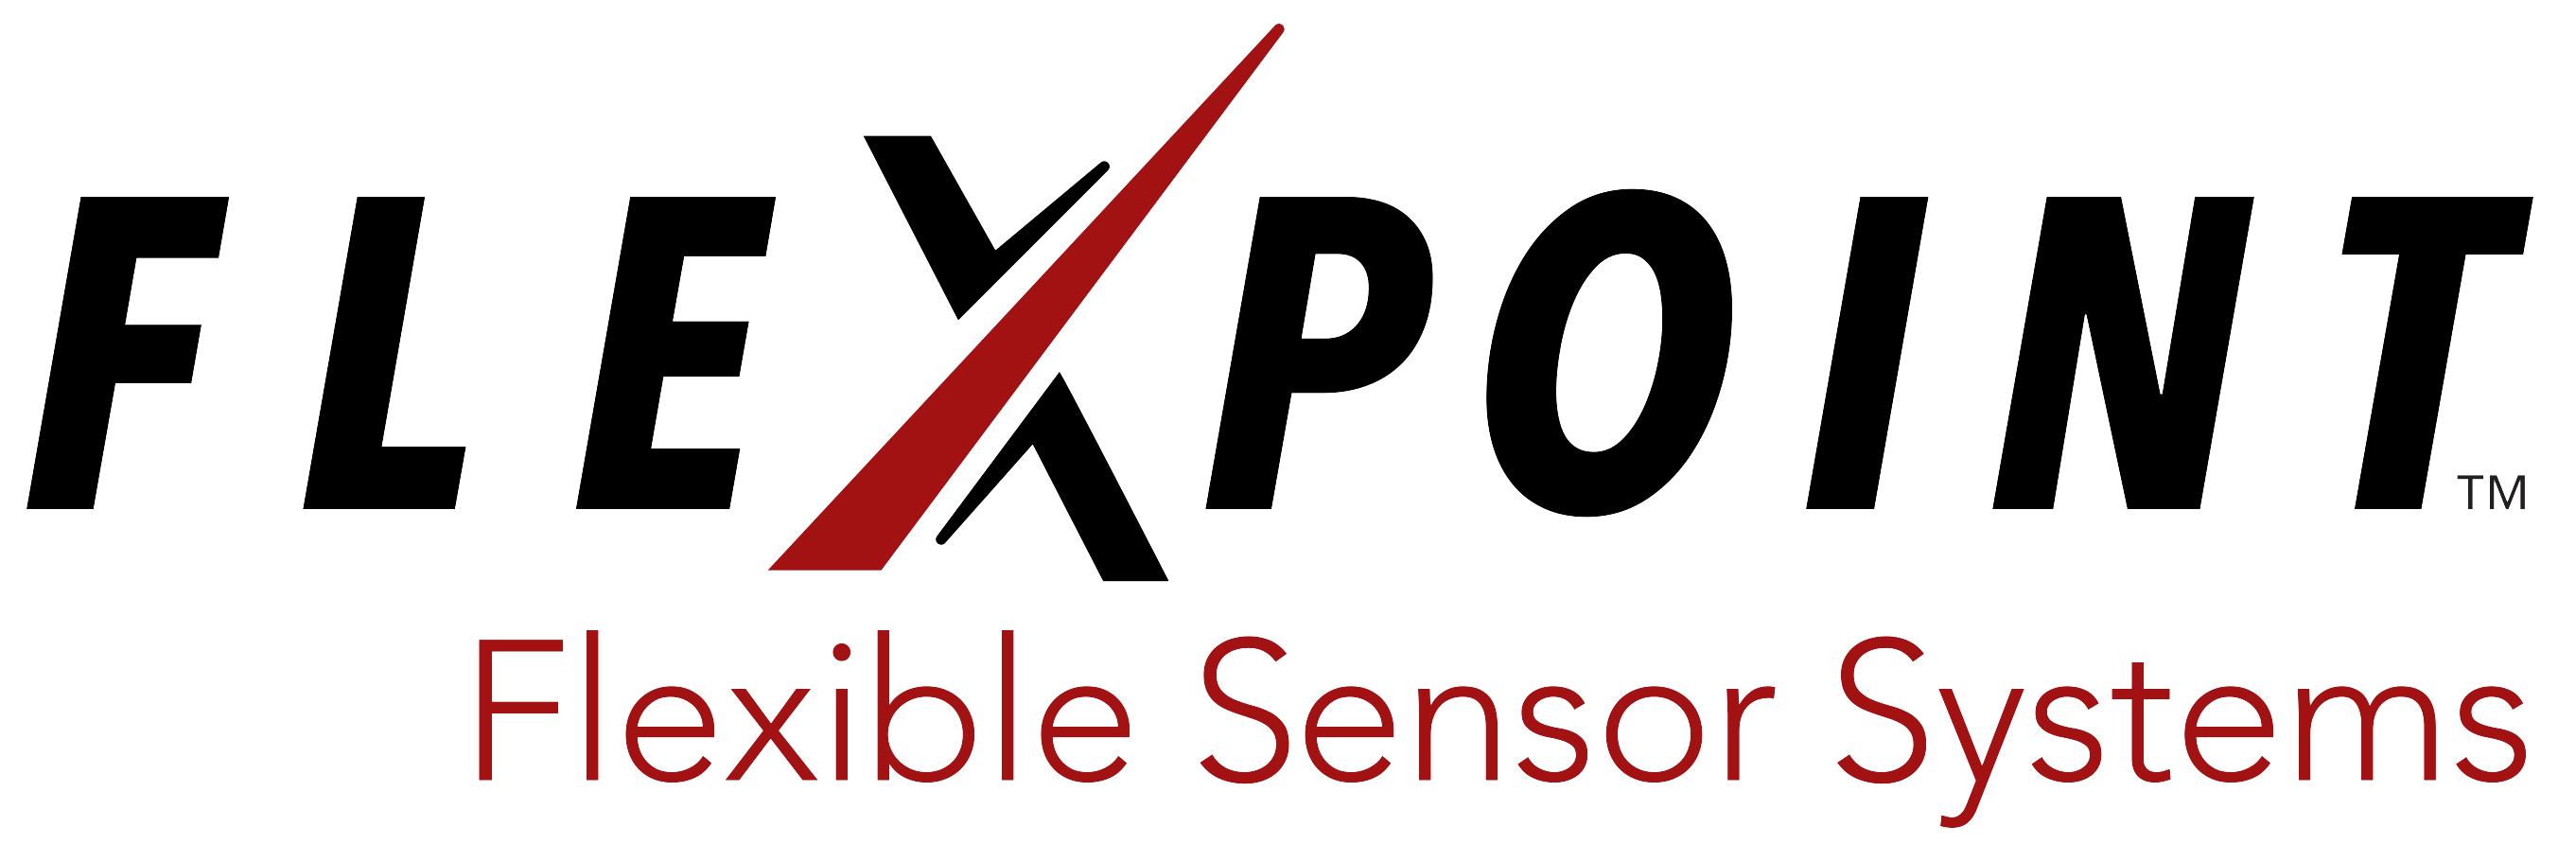 Flexpoint Sensor Systems, Inc.